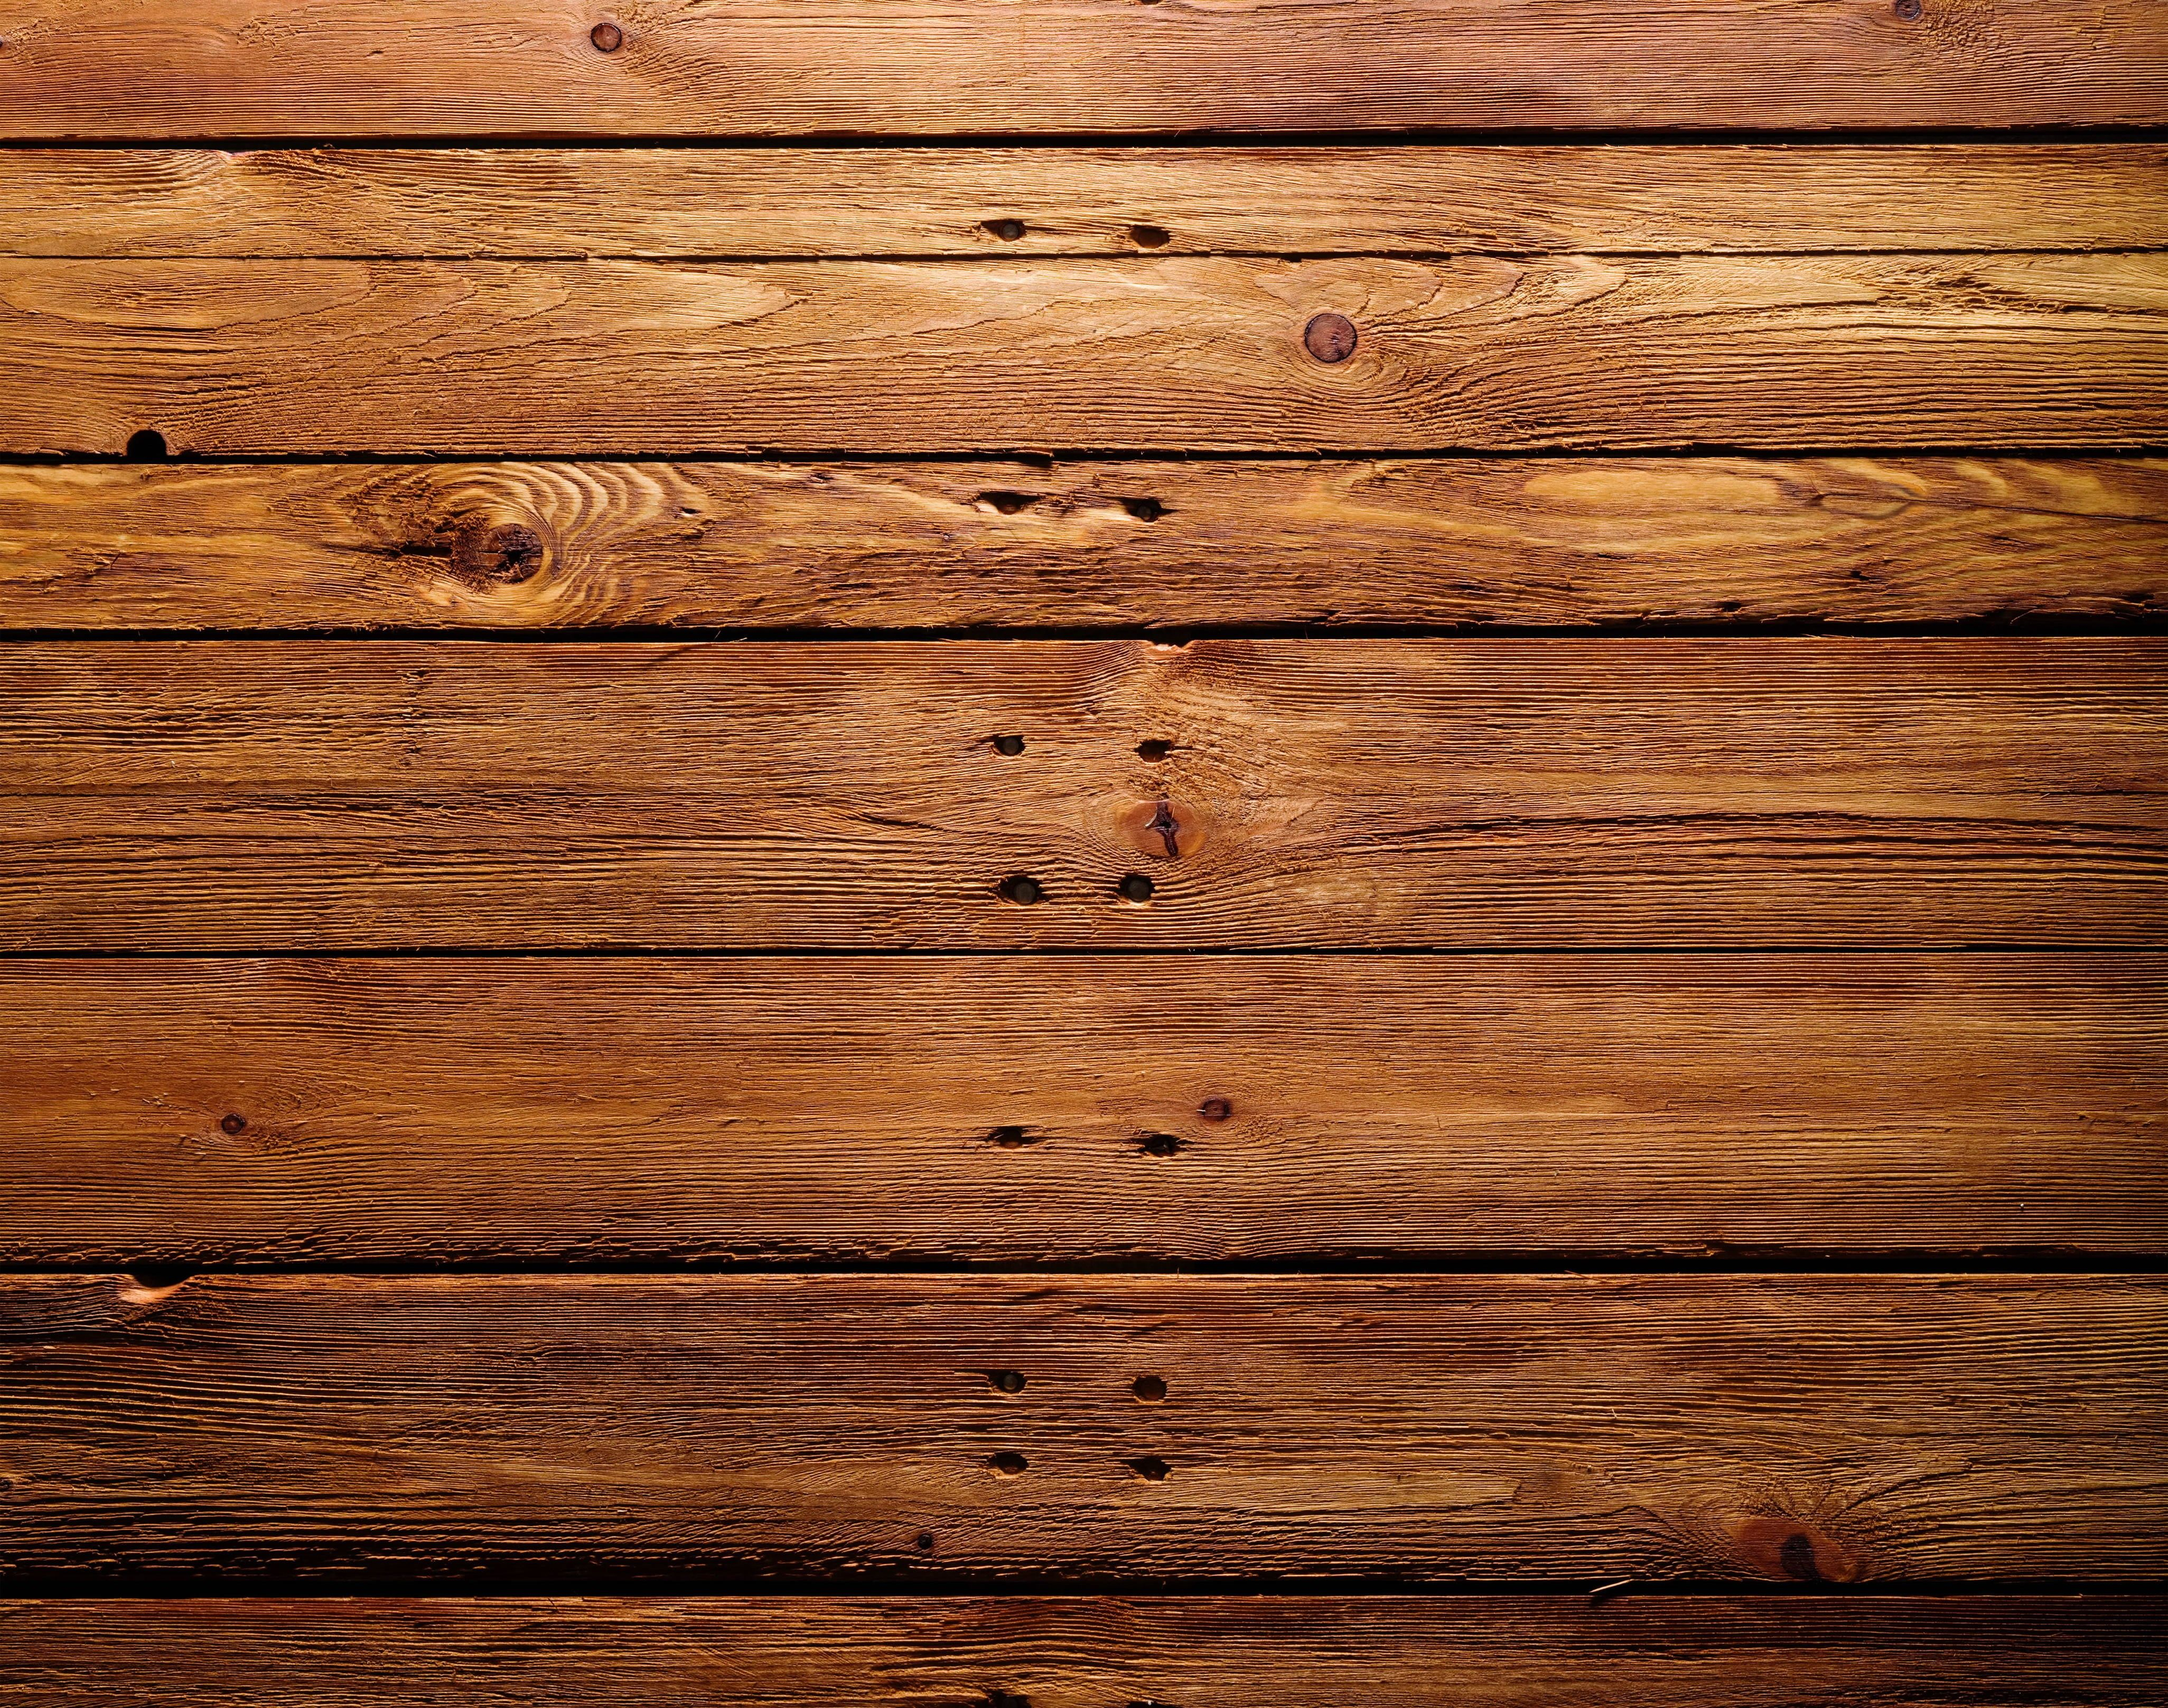 Brown Parquet Floor Wood Timber Closeup Texture 4k Wallpaper Hdwallpaper Desktop Wood Wallpaper Wood Texture Cabins In The Woods